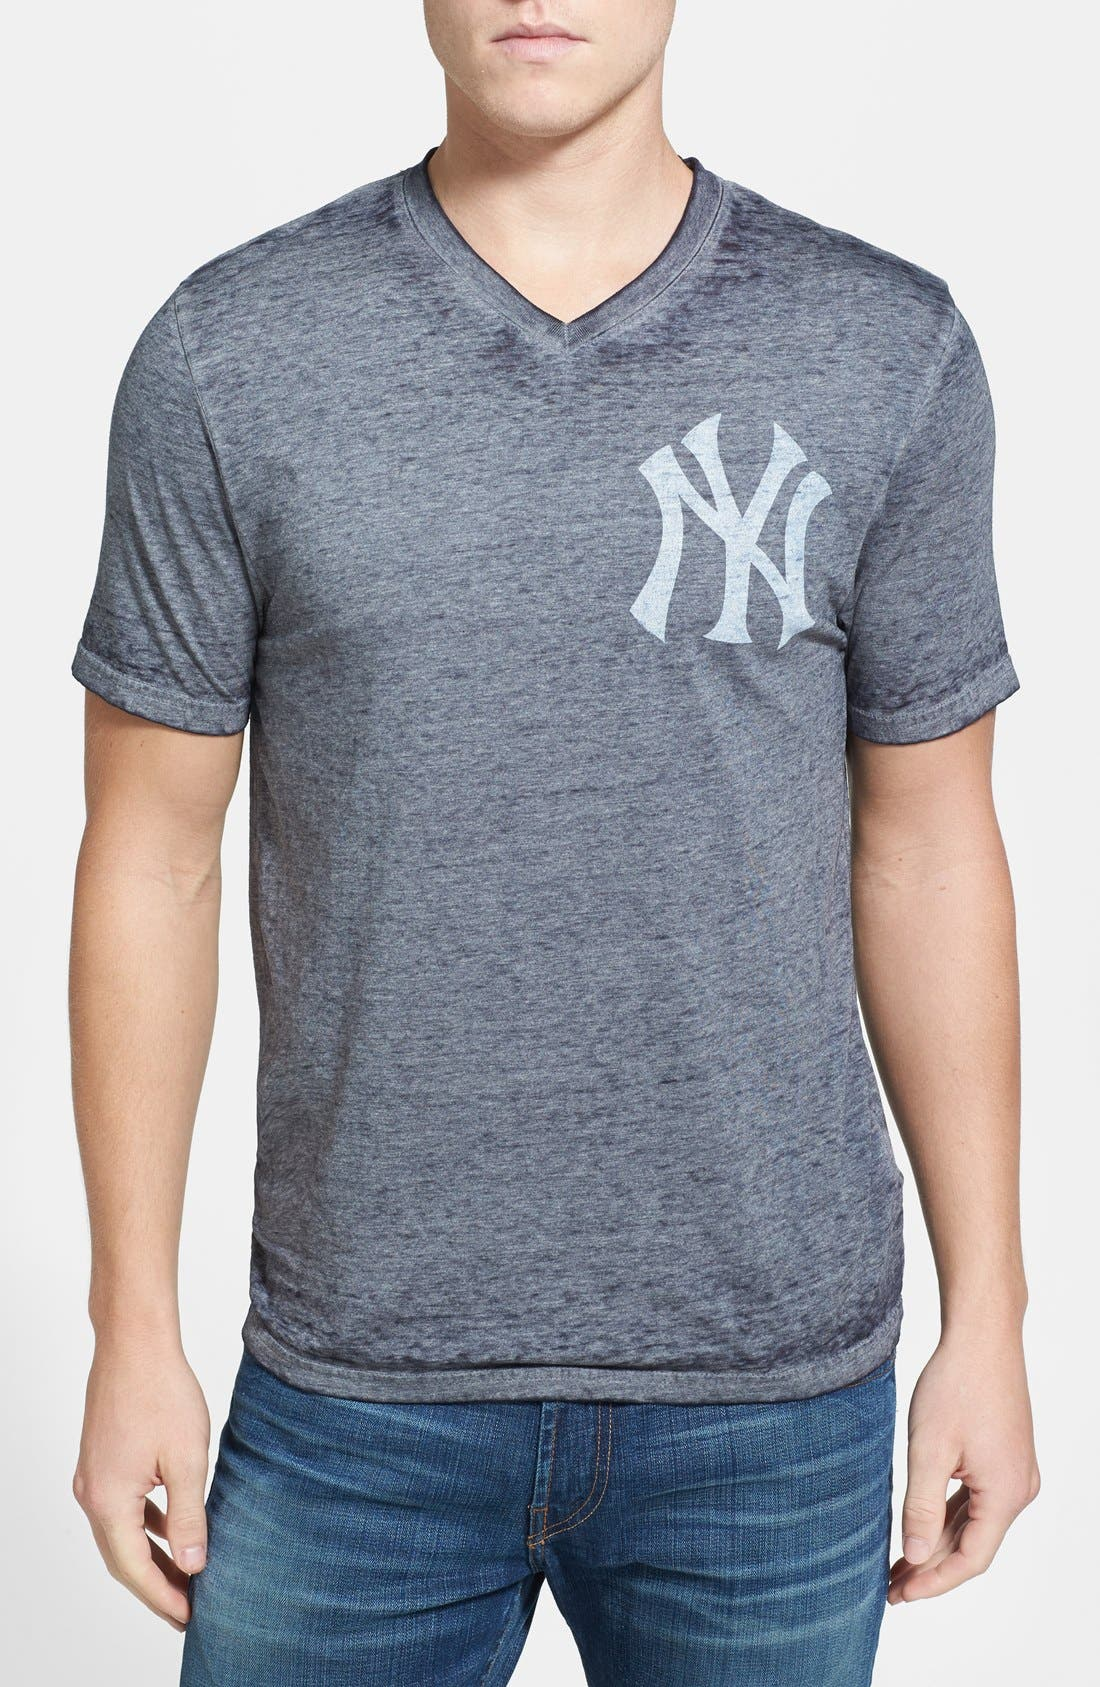 Alternate Image 1 Selected - Red Jacket 'New York Yankees - Burnout' V-Neck T-Shirt